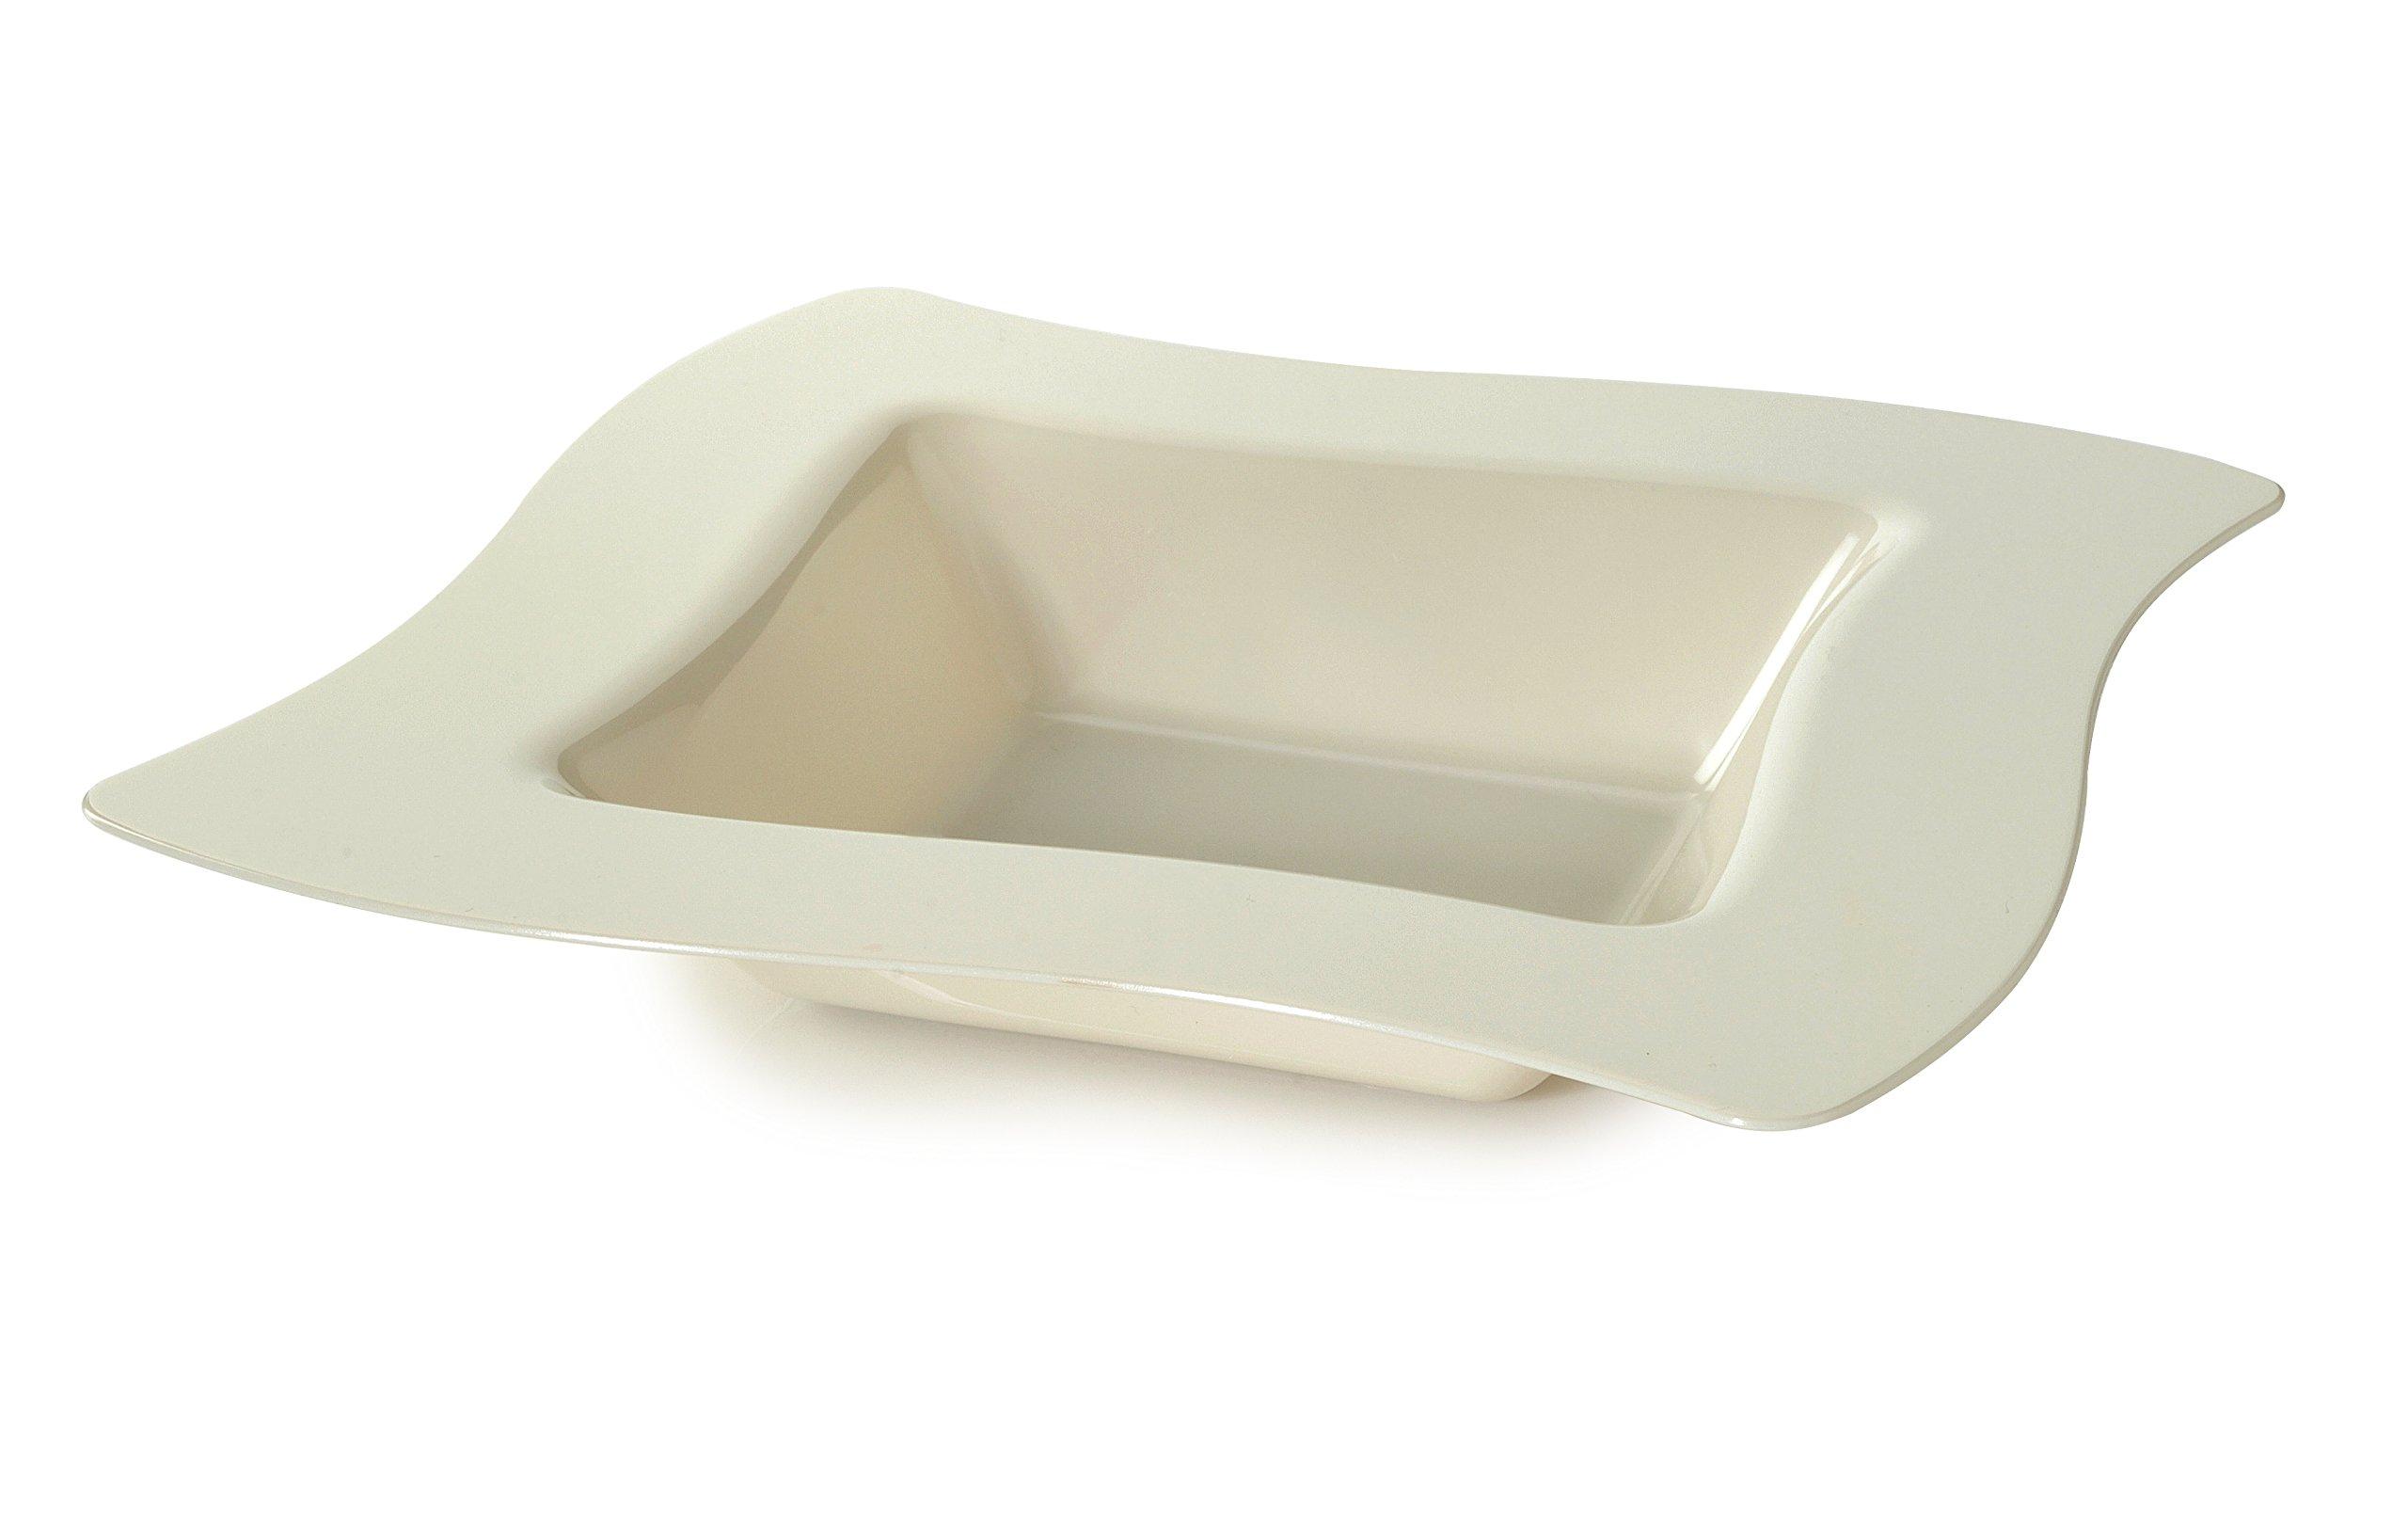 Fineline Wave trends 12 oz Bowl (Case of 120) (10 x 12), Bone